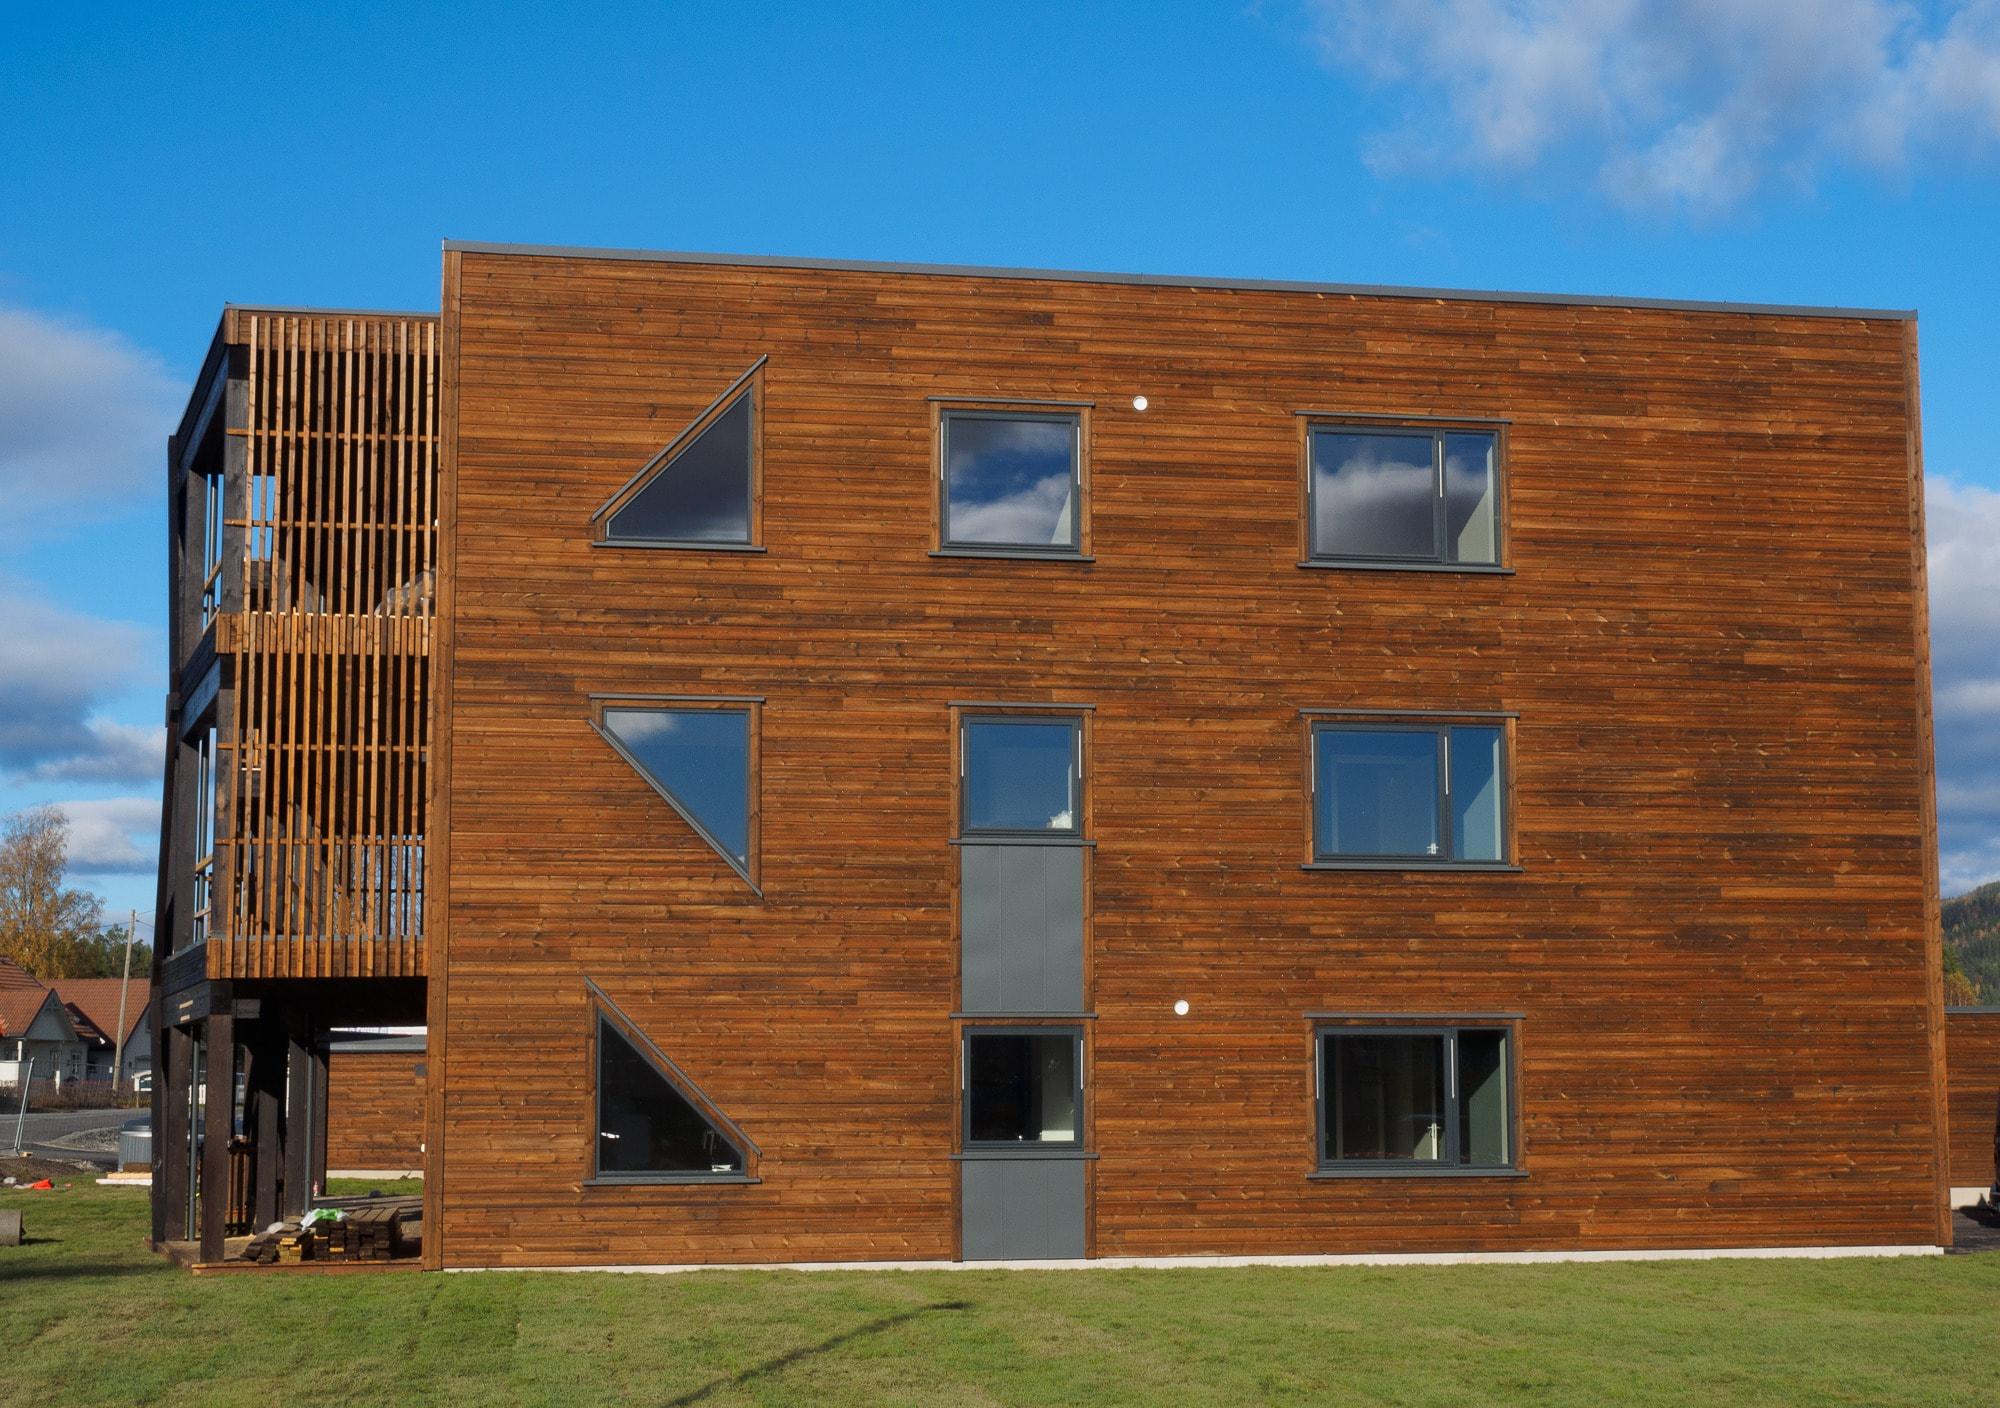 Facade, House, Brick, Building, Property, Architecture